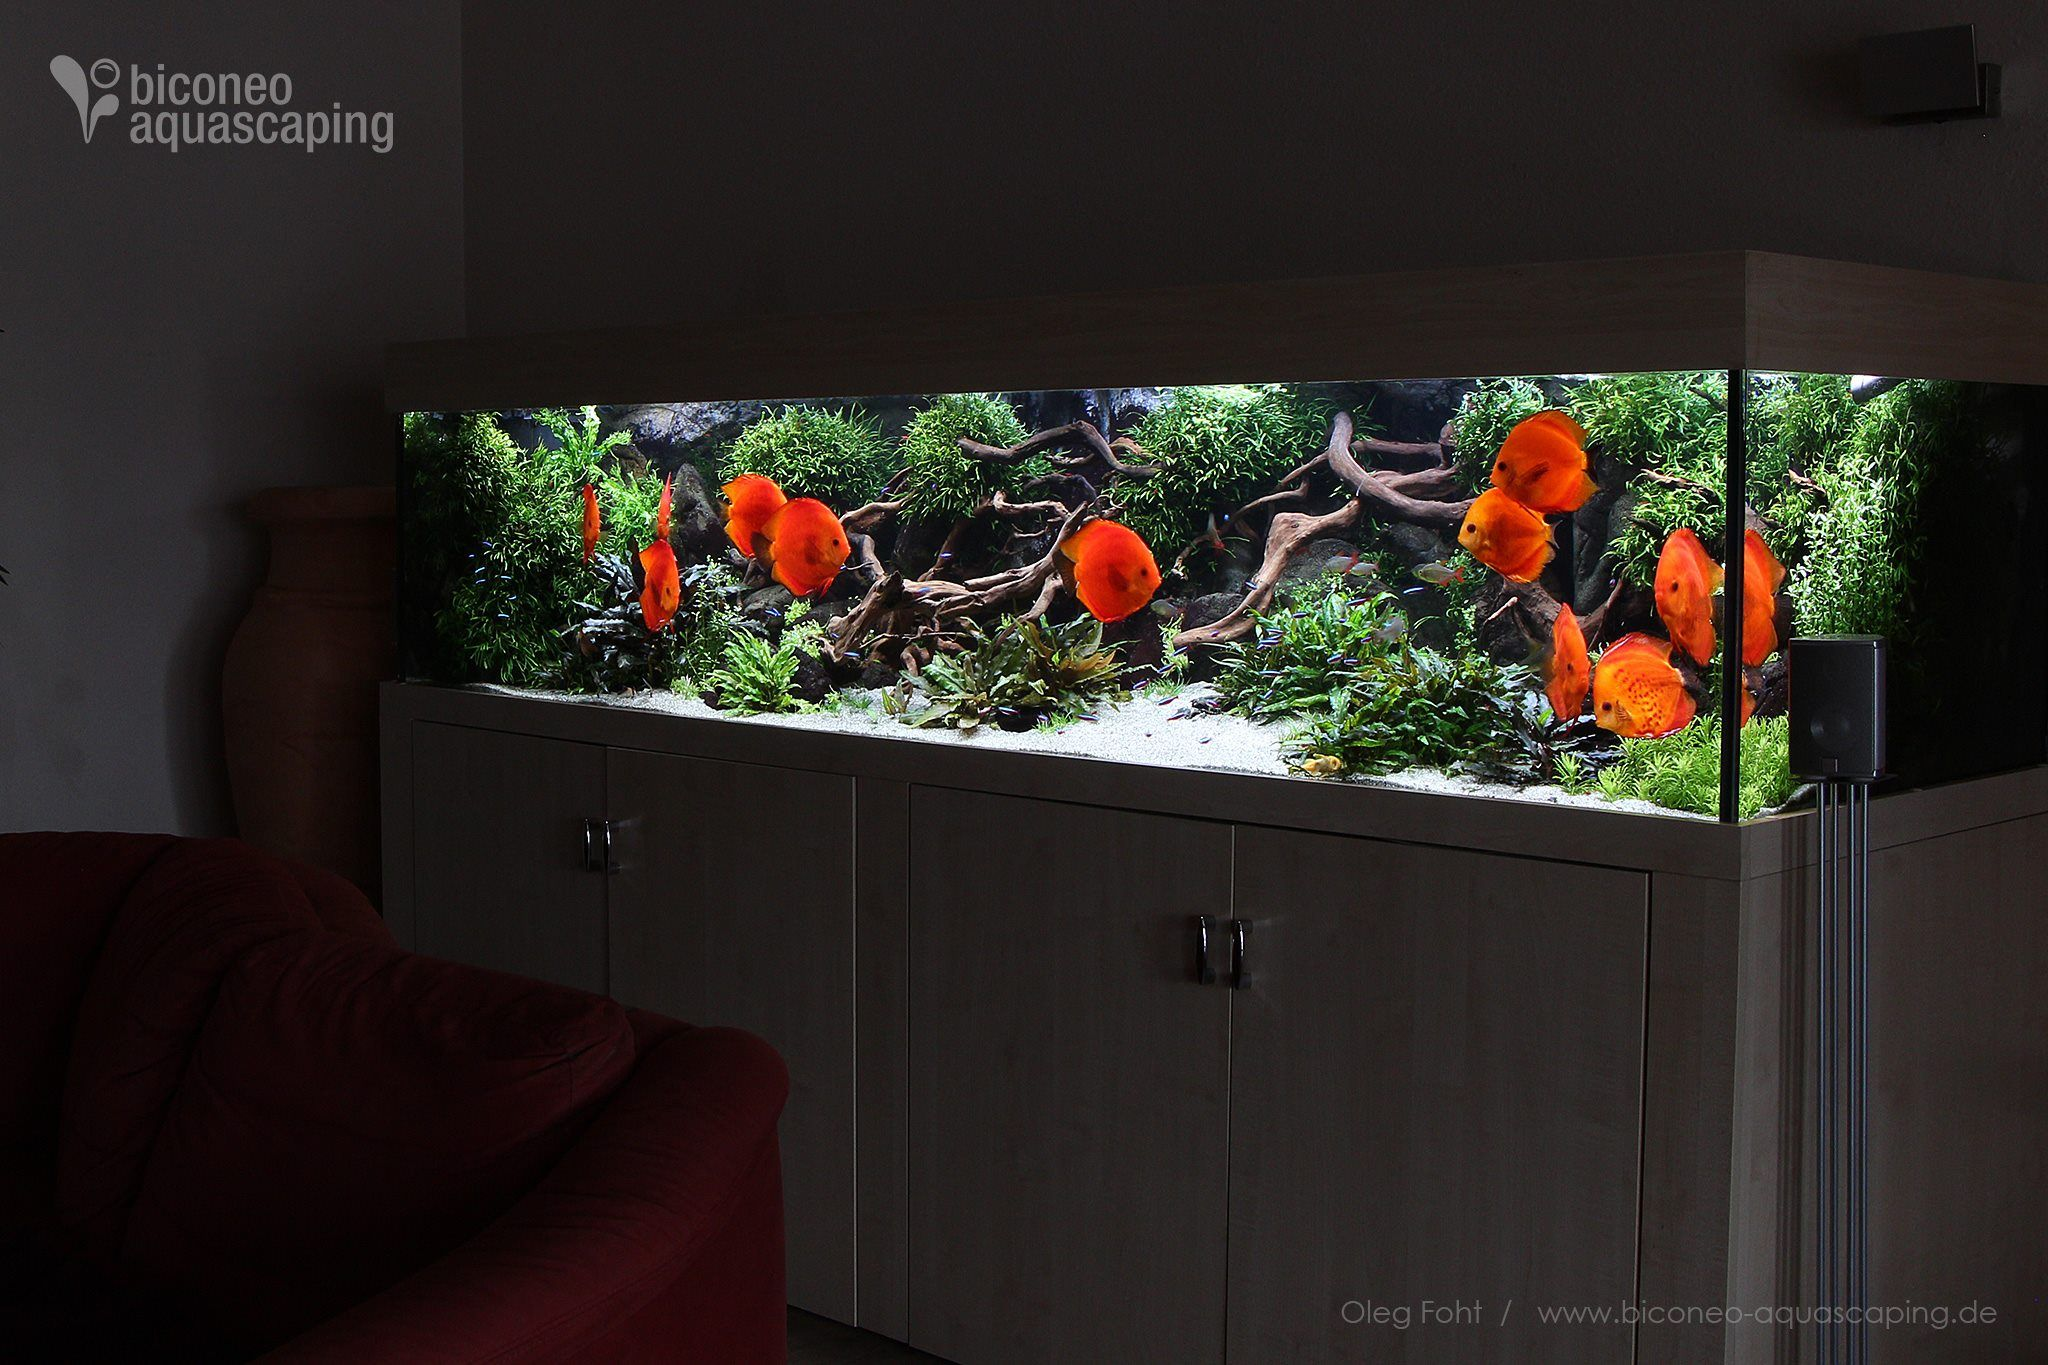 5d5d495455d678976805d47c647f978a Frais De Aquarium 450 Litres Des Idées